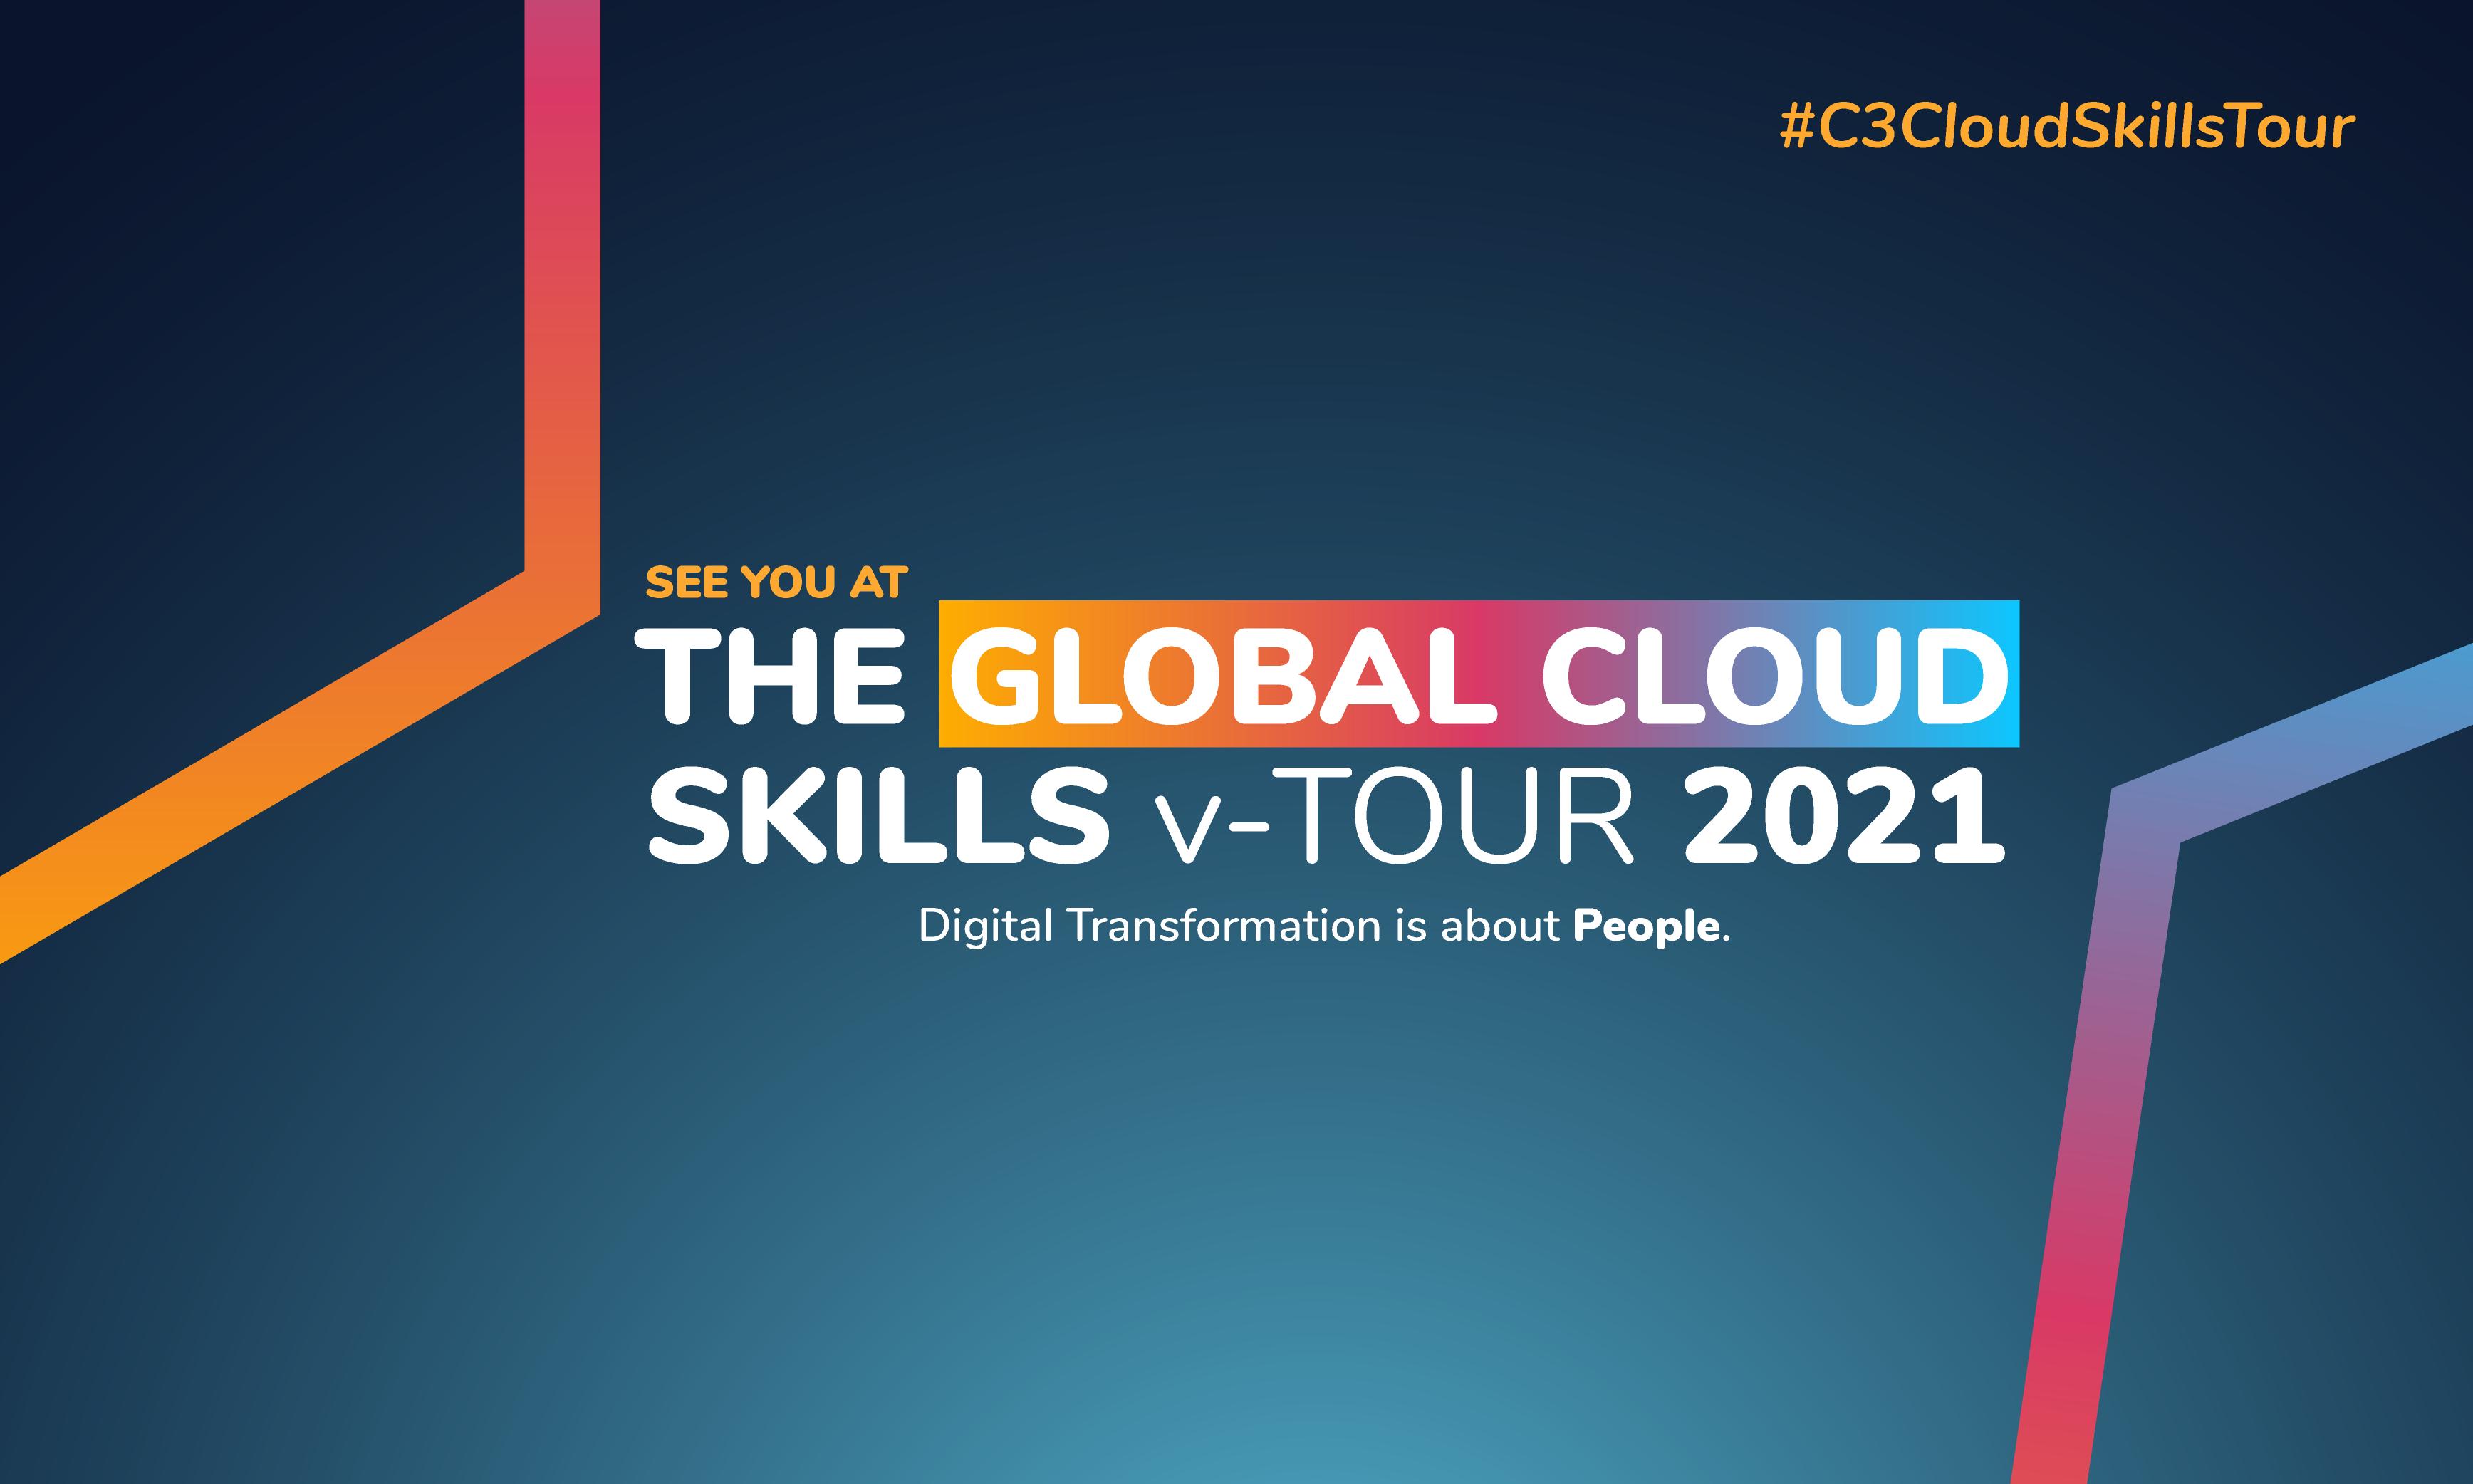 Rumos no C3 Global Cloud Skills v-Tour